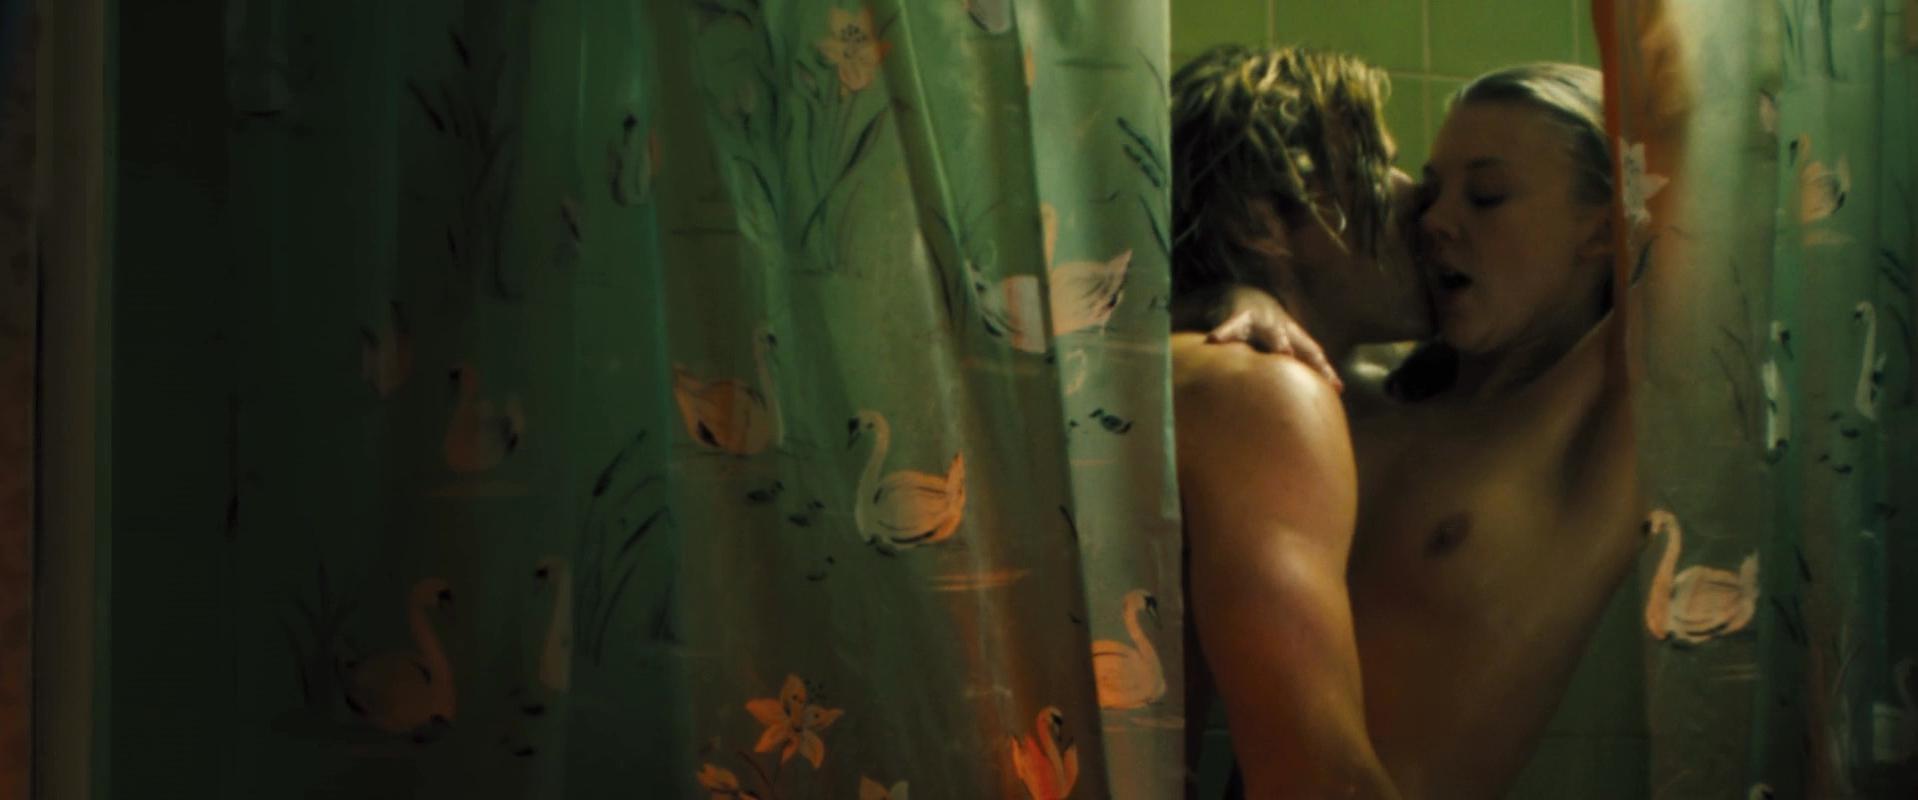 Alexandra maria lara nude scene